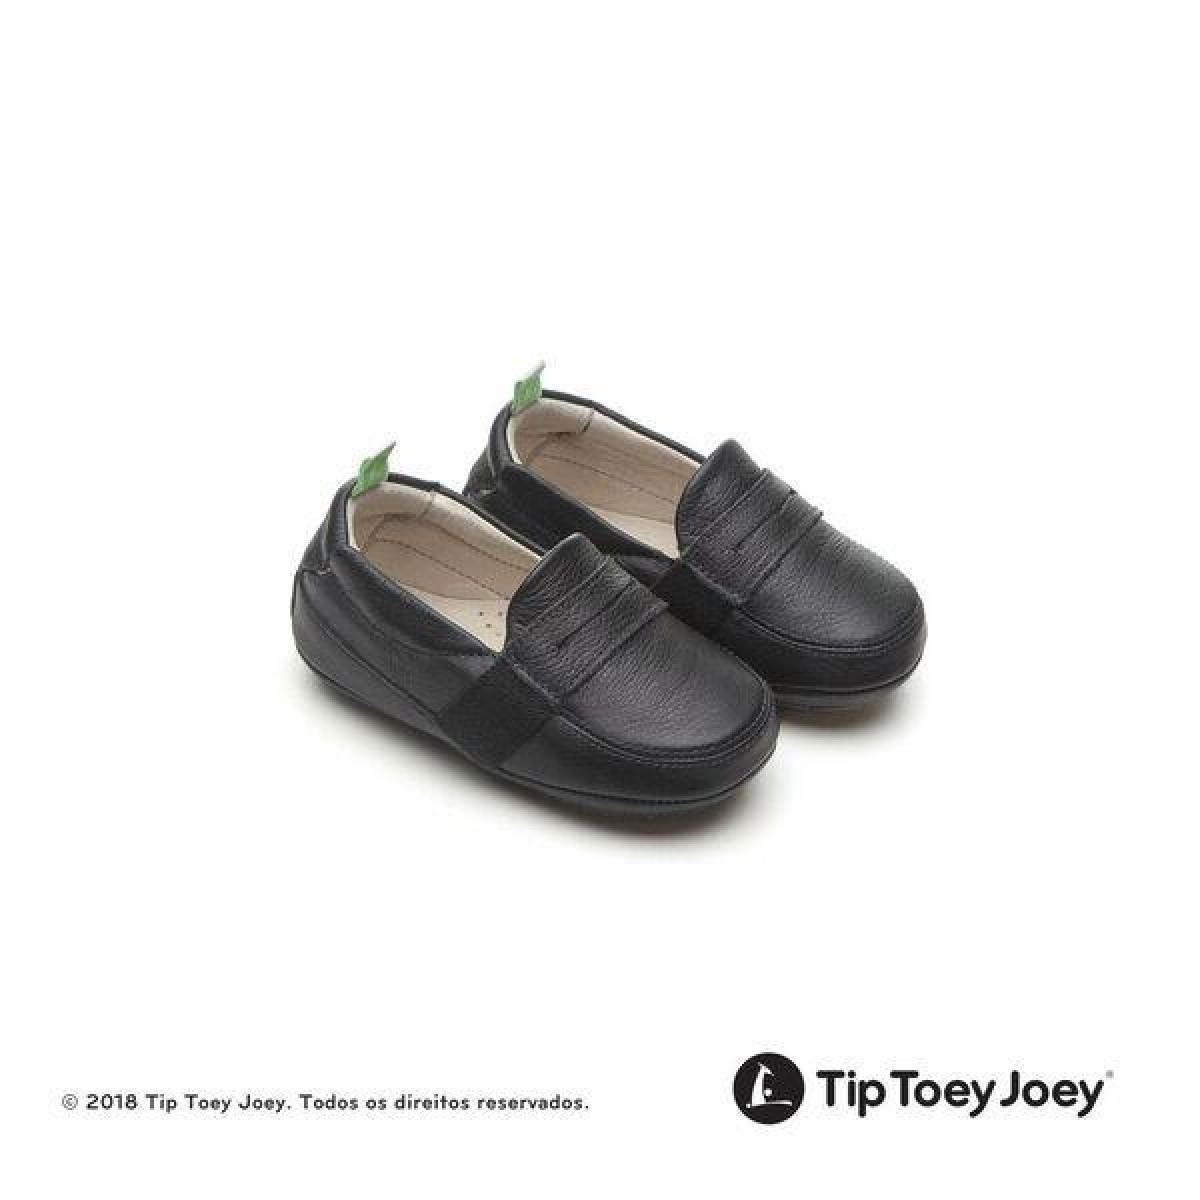 8d0547d96f SAPATO TIP TOEY JOEY SHARPY BLACK (PRETO) - Tutti Frutti Calçados ...